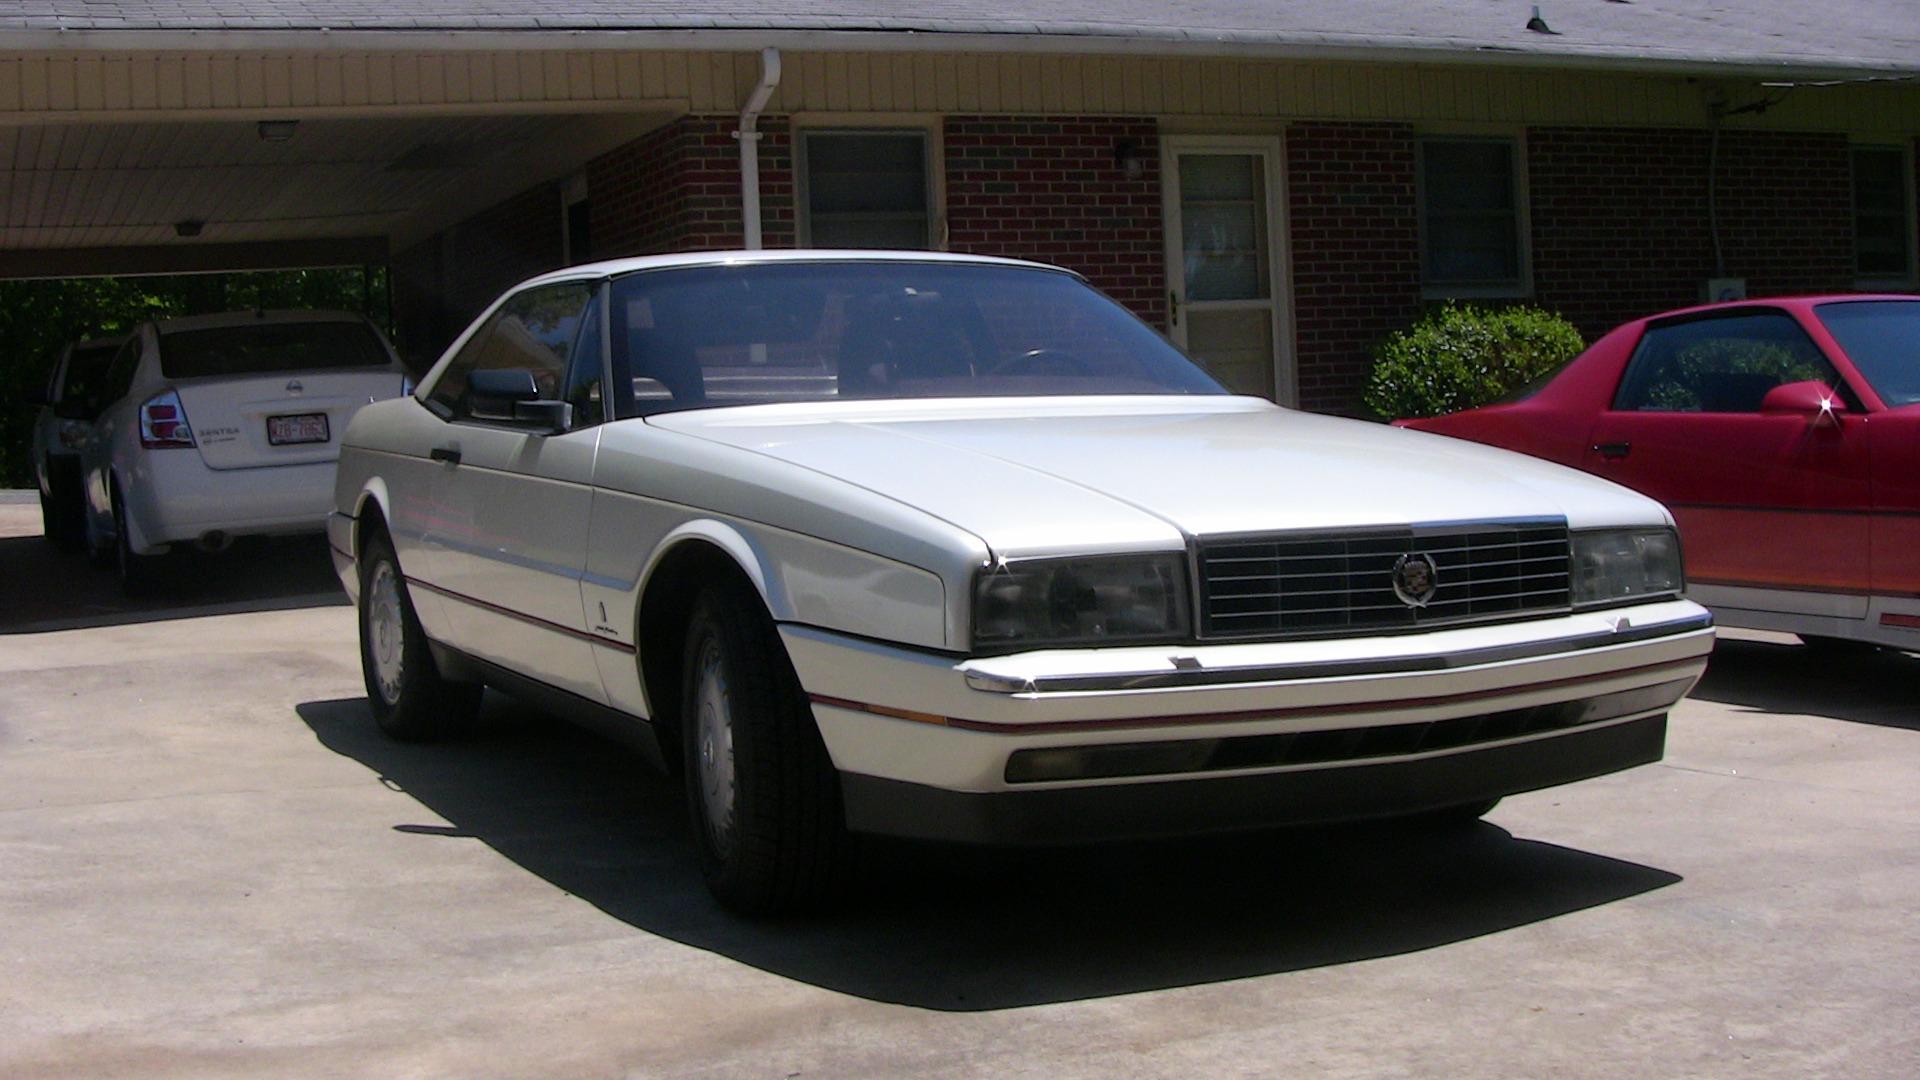 Used 1987 Cadillac Allante Pinafarina Convertible  124 , For Sale $11000, Call Us: (704) 996-3735